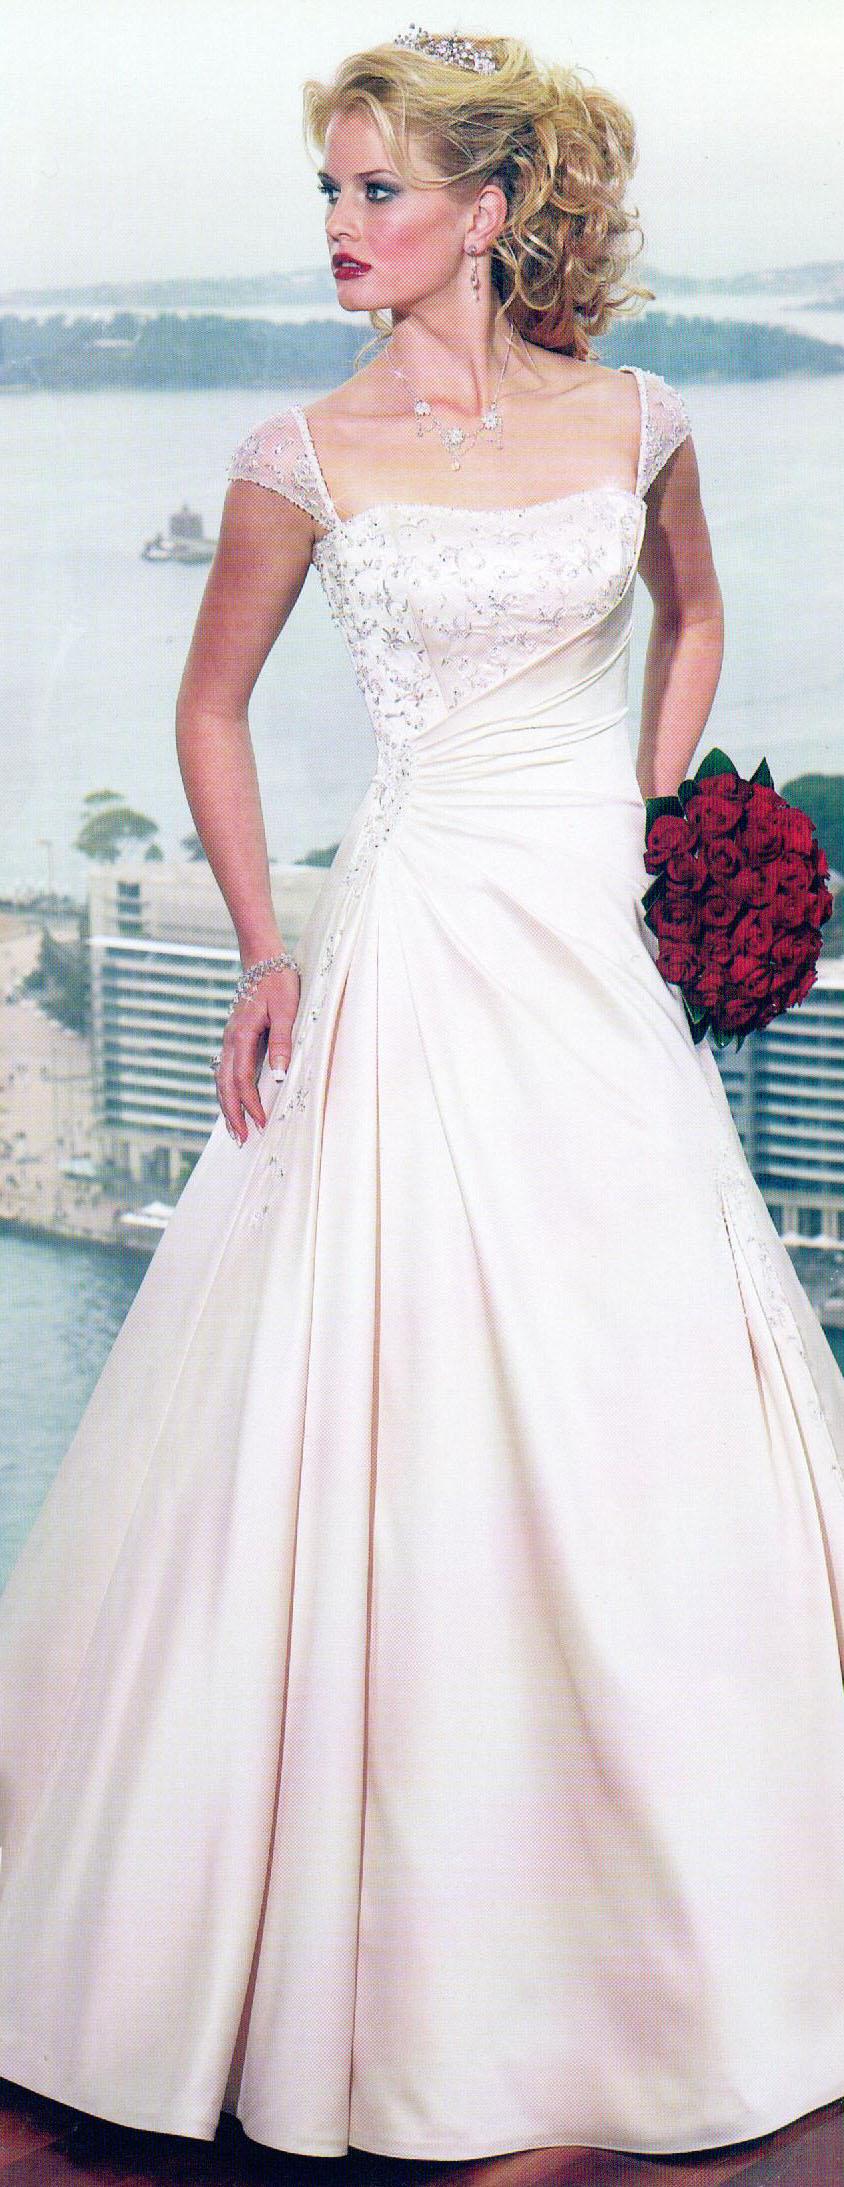 wedding dresses las vegas wedding dresses las vegas Wedding Dresses Las Vegas